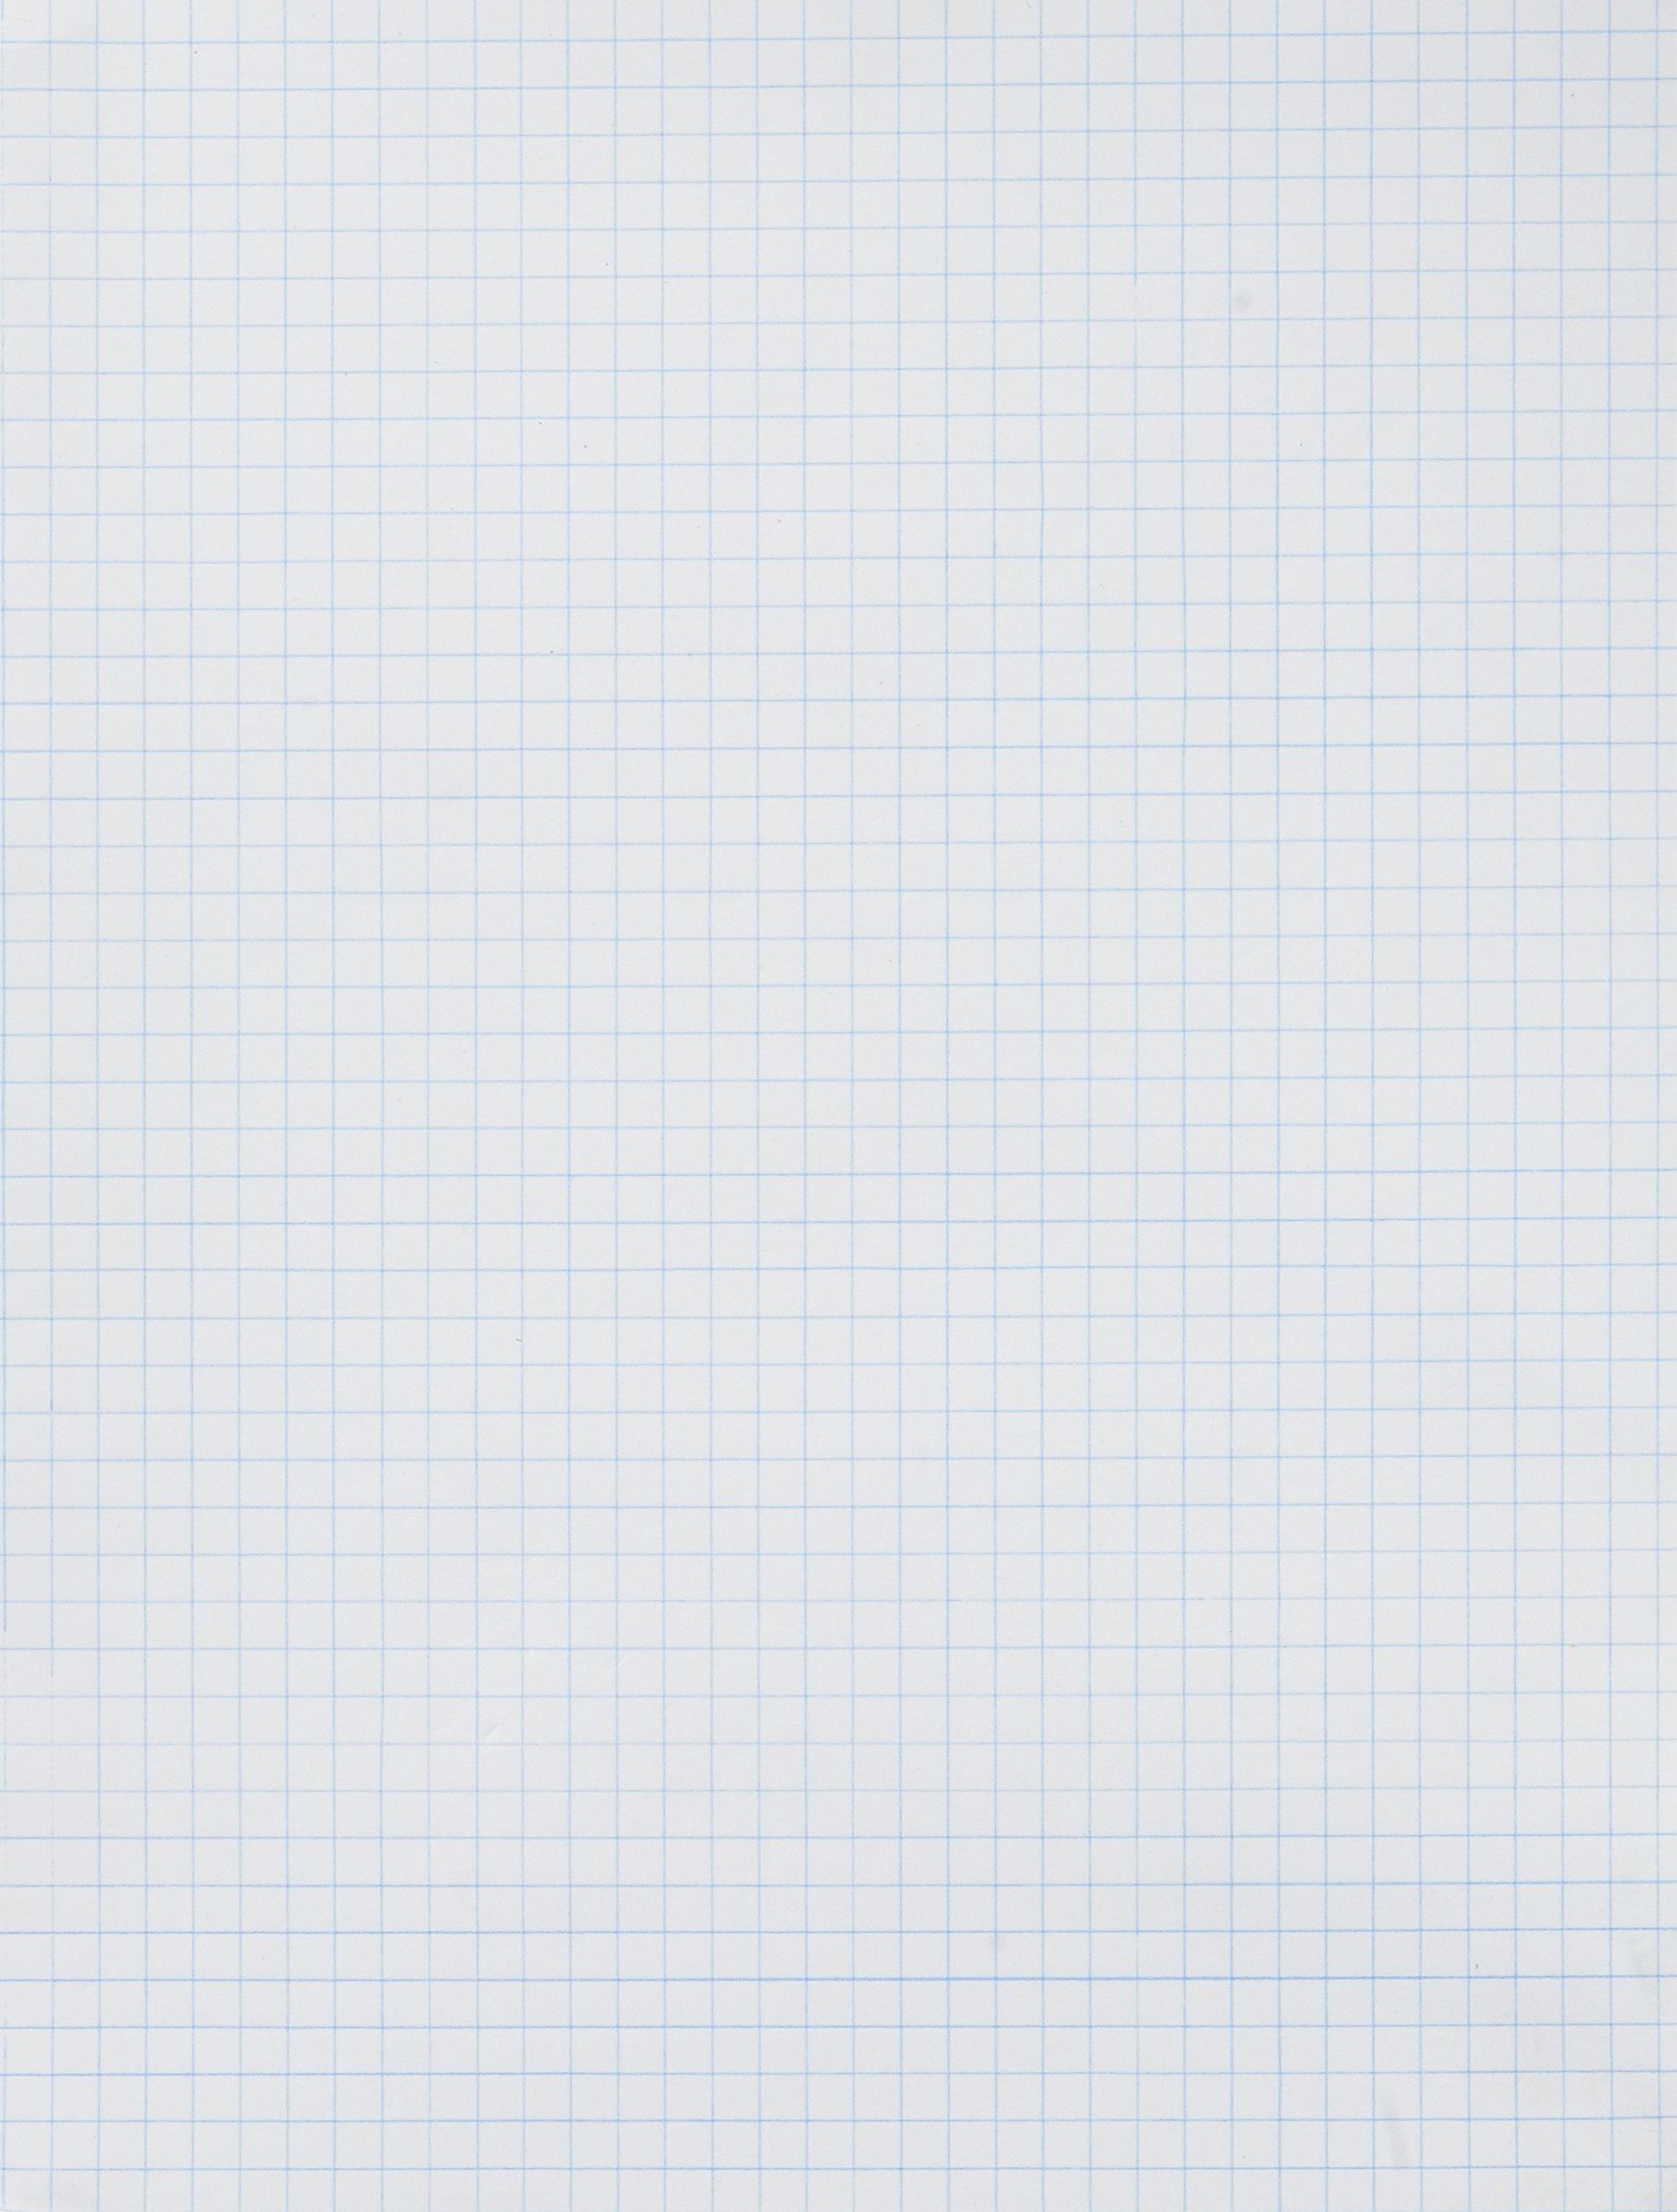 School Smart Graph Paper 1 4 Inch Rule 9 X 12 Inches White